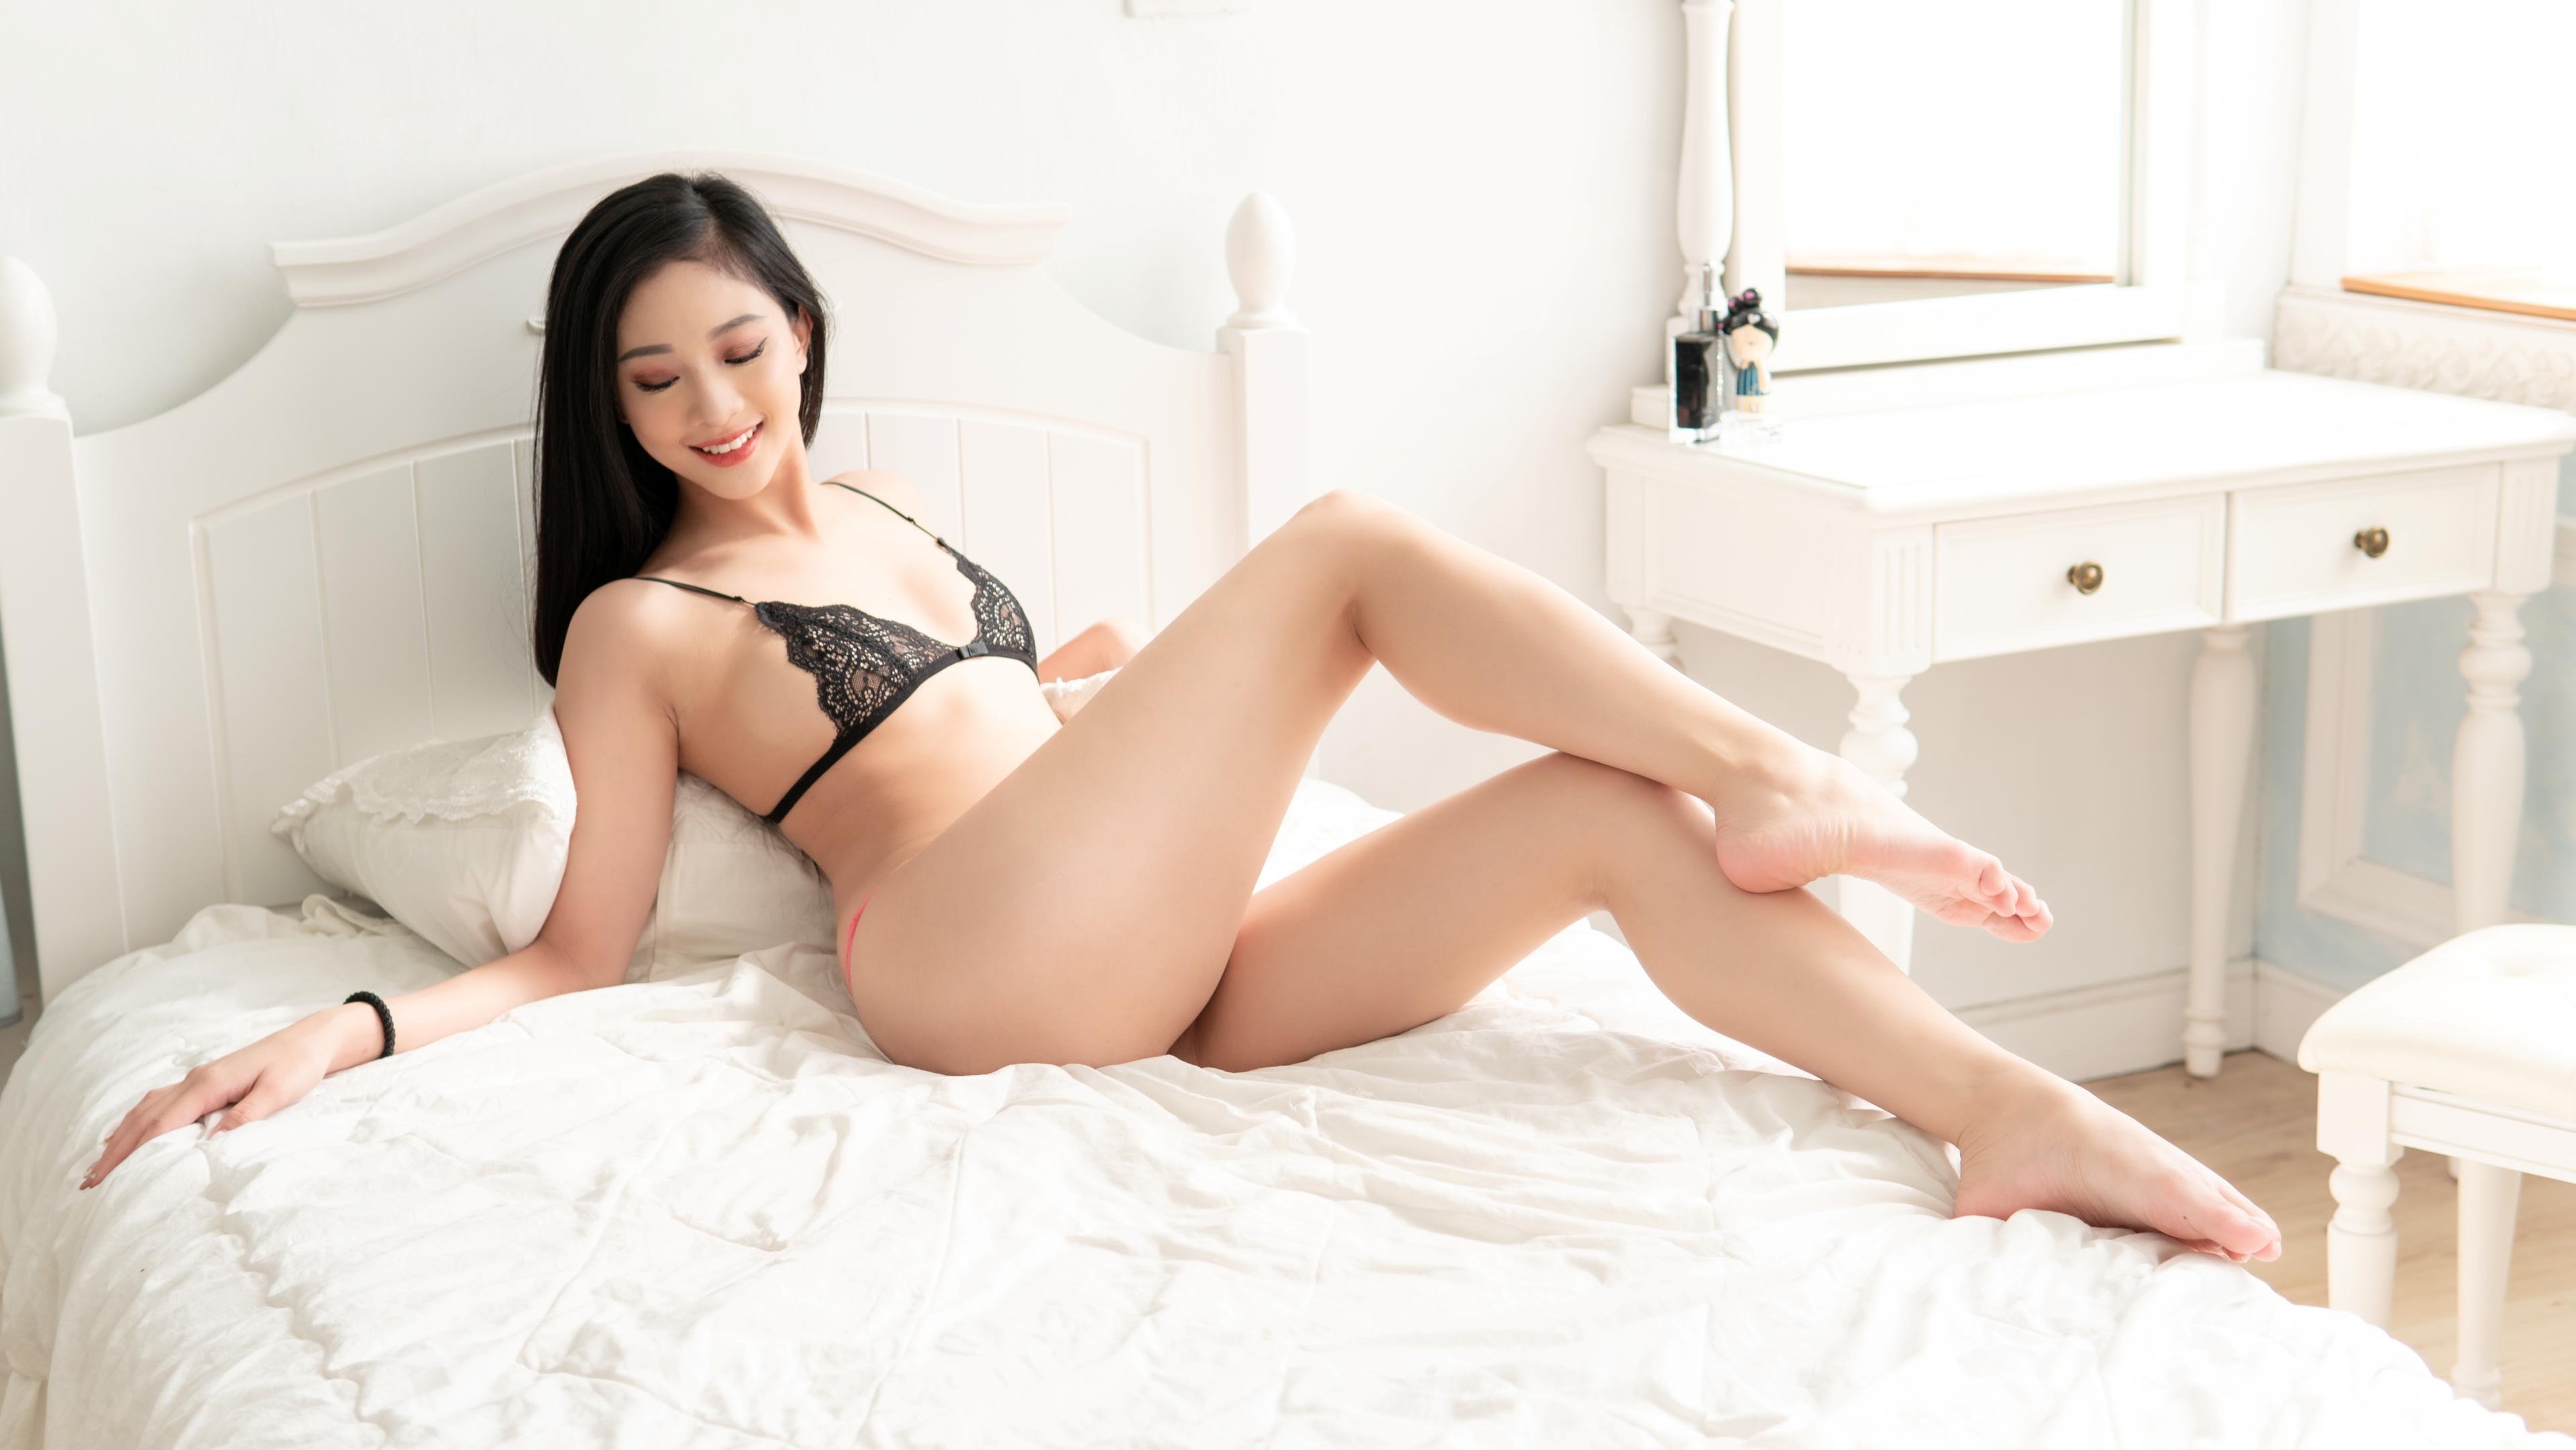 People 3840x2161 Jessie Tsai women model Asian brunette underwear bra G-strings lingerie sitting closed eyes smiling barefoot pointed toes in bed indoors women indoors